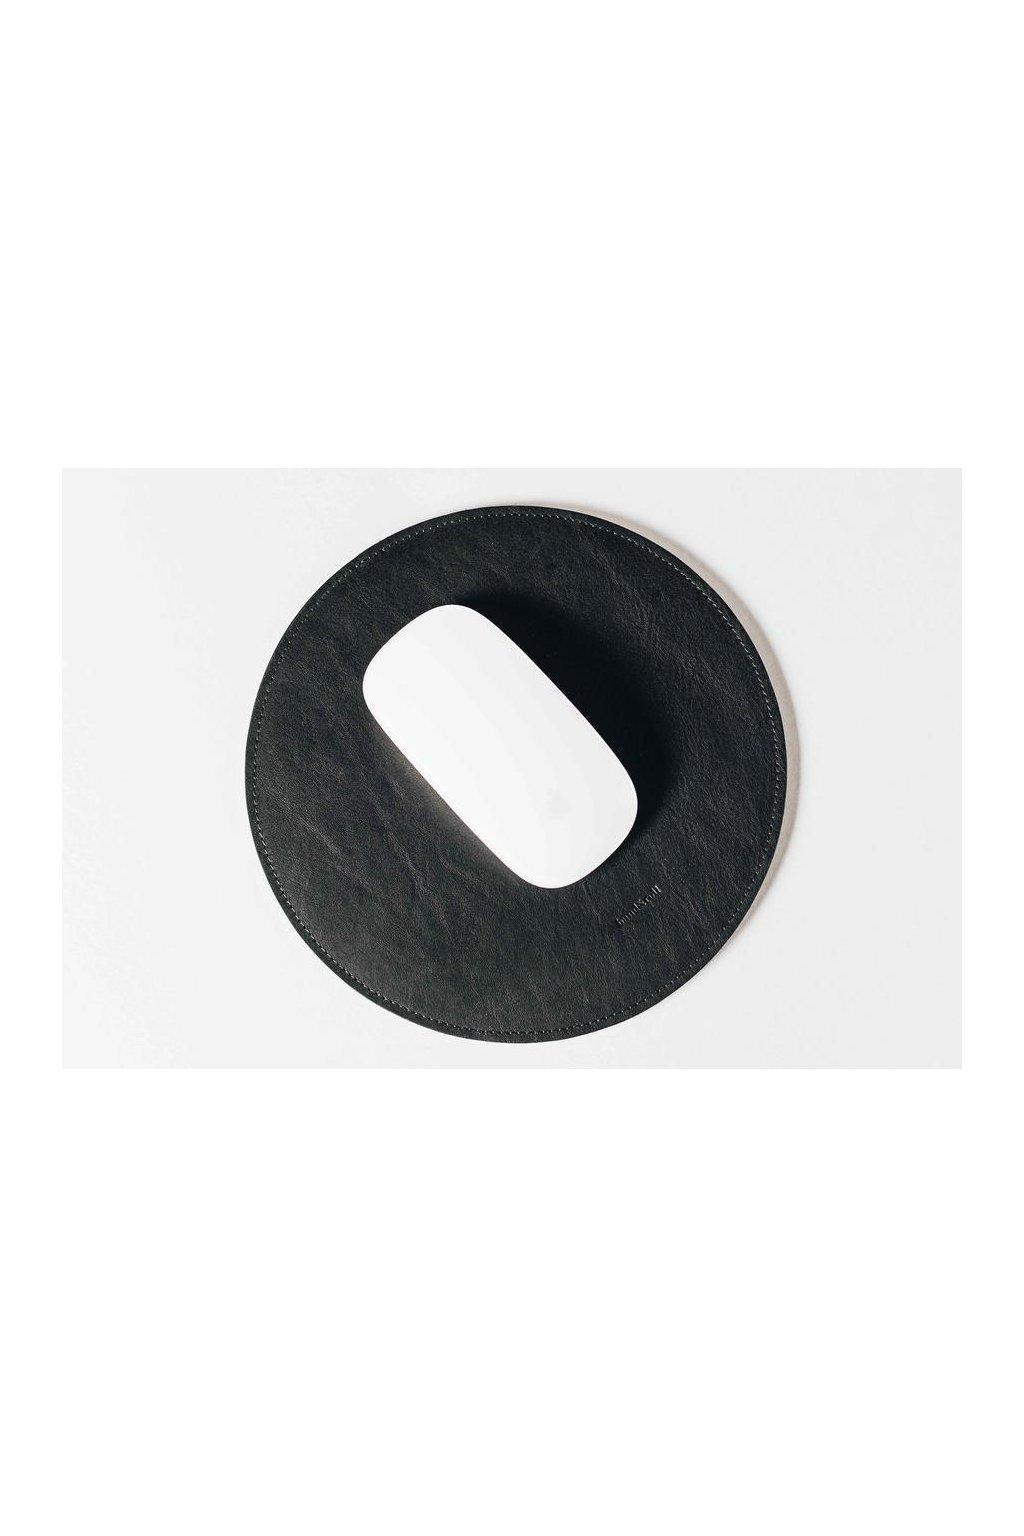 Mouse pad Black 3 jpg 900x